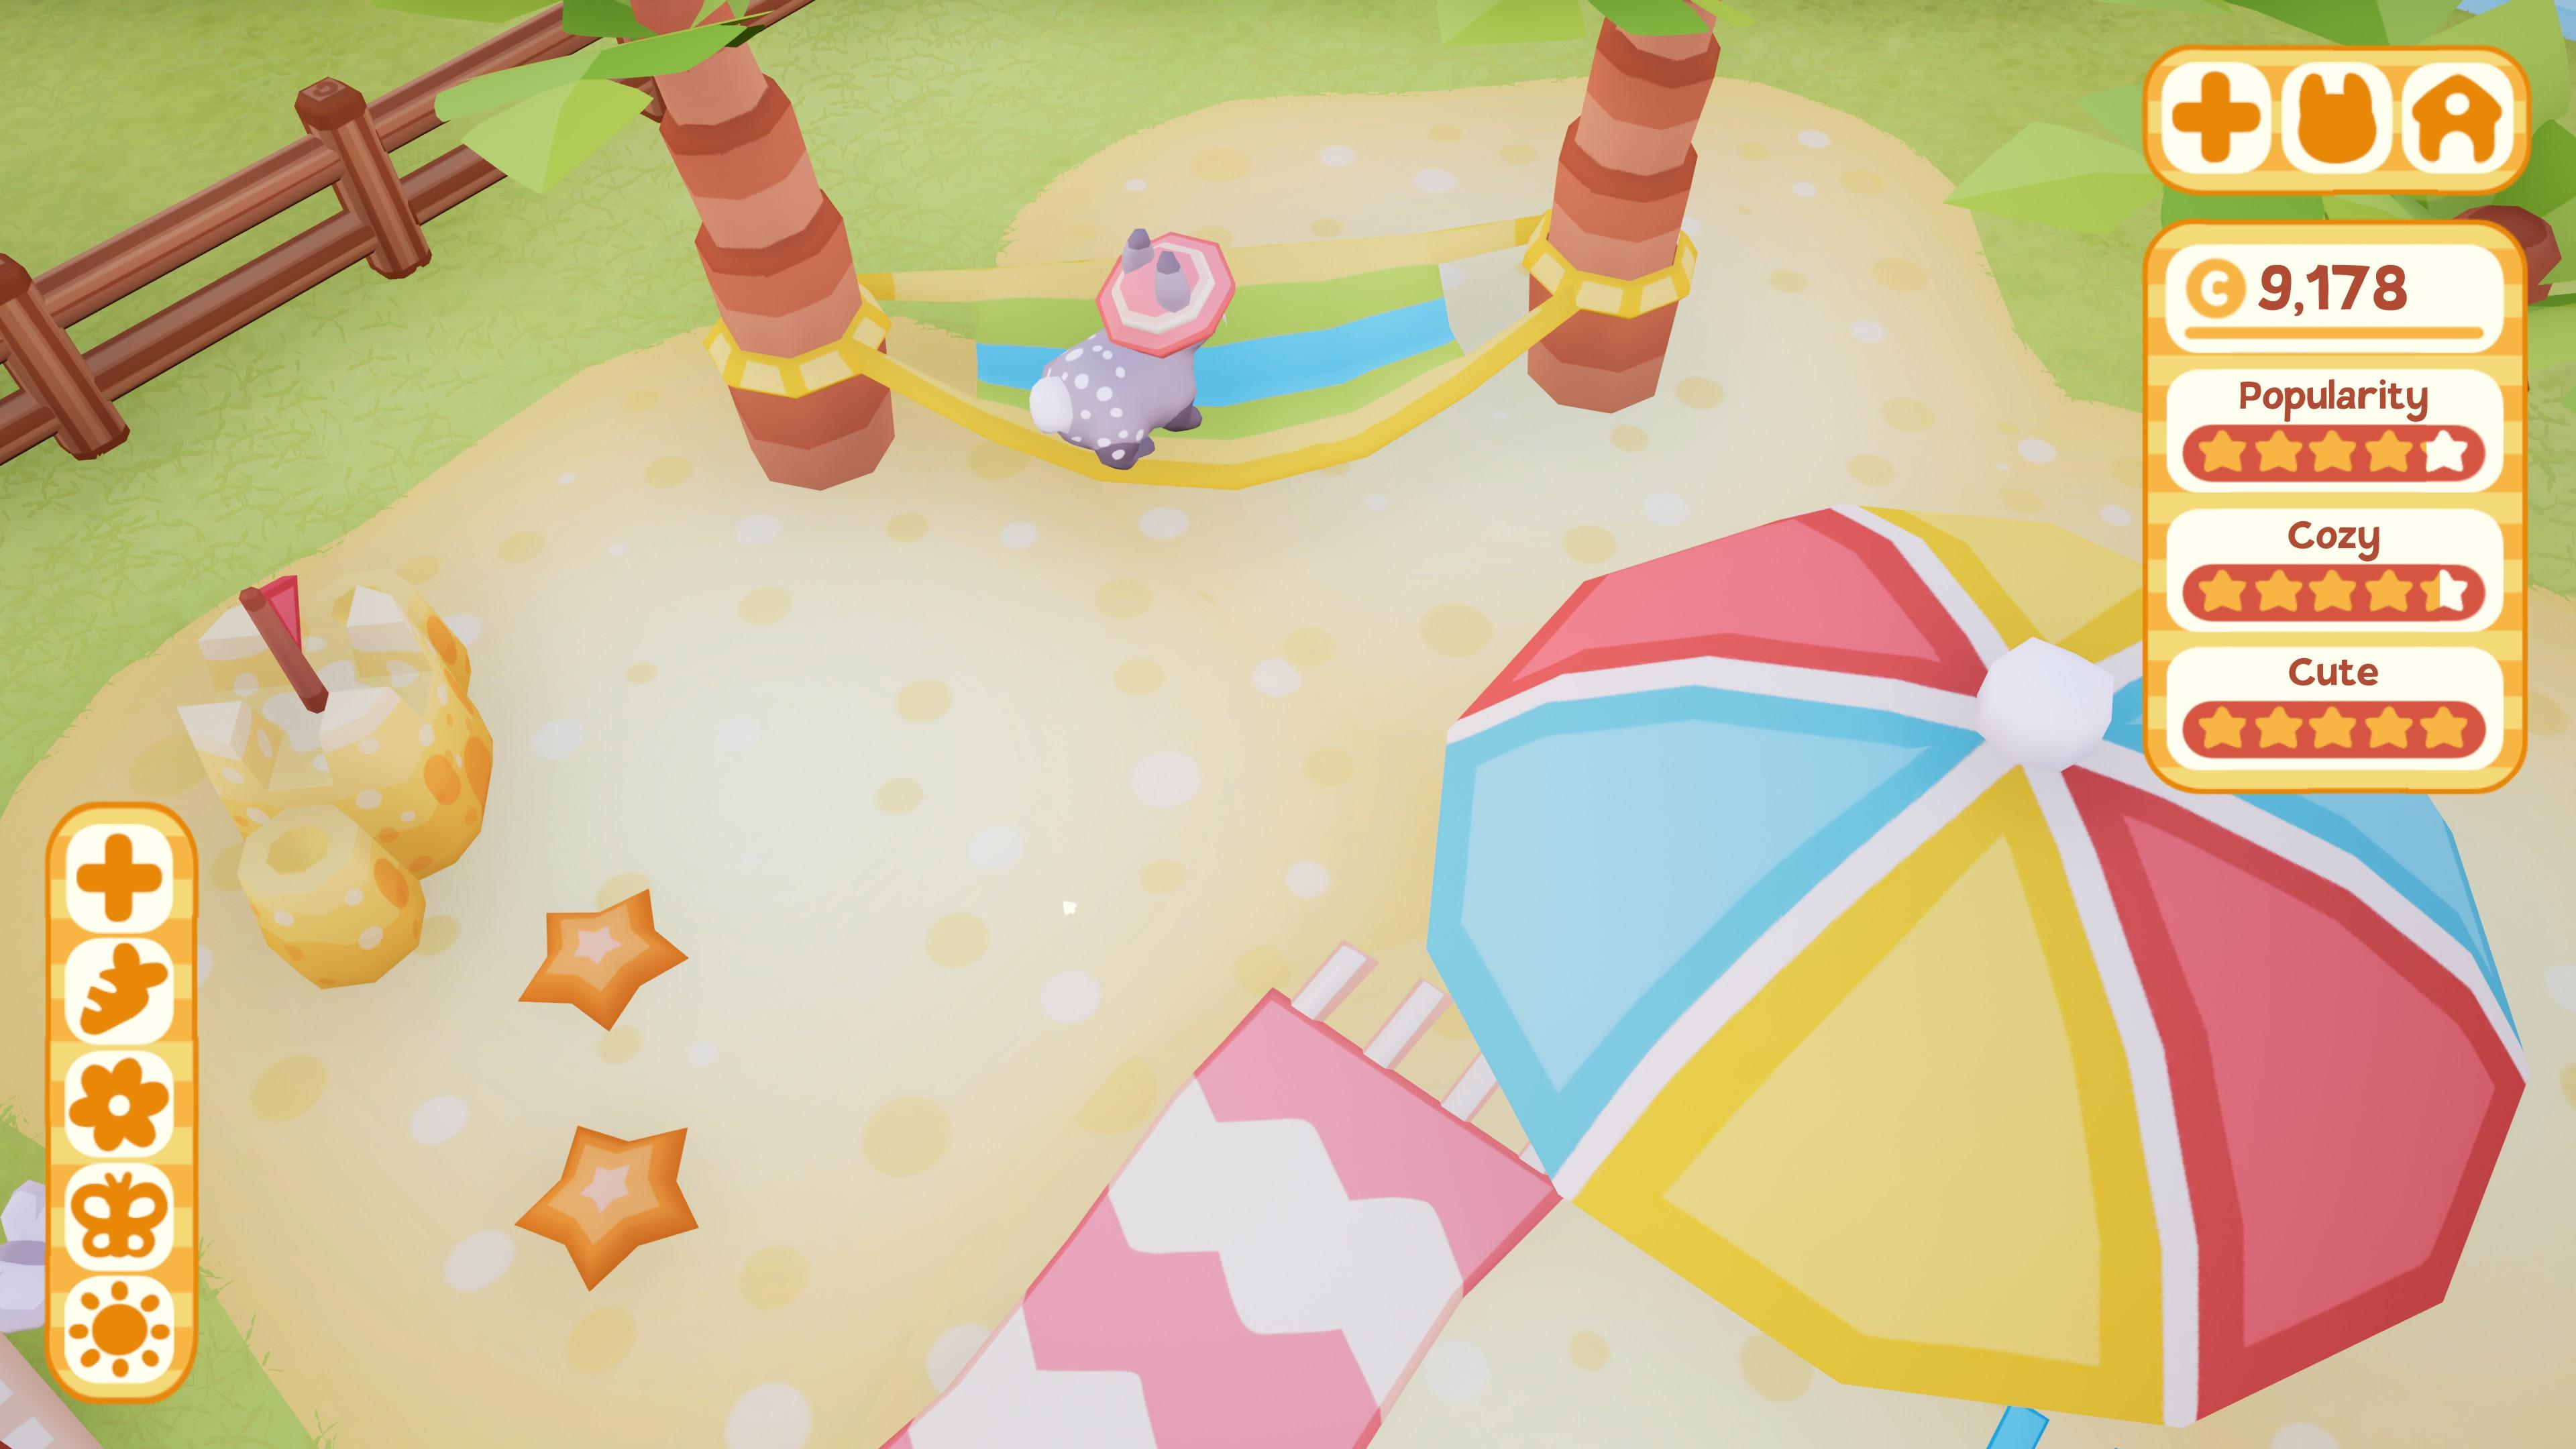 Bunny Park. Bunny in a hammock wearing a sun hat